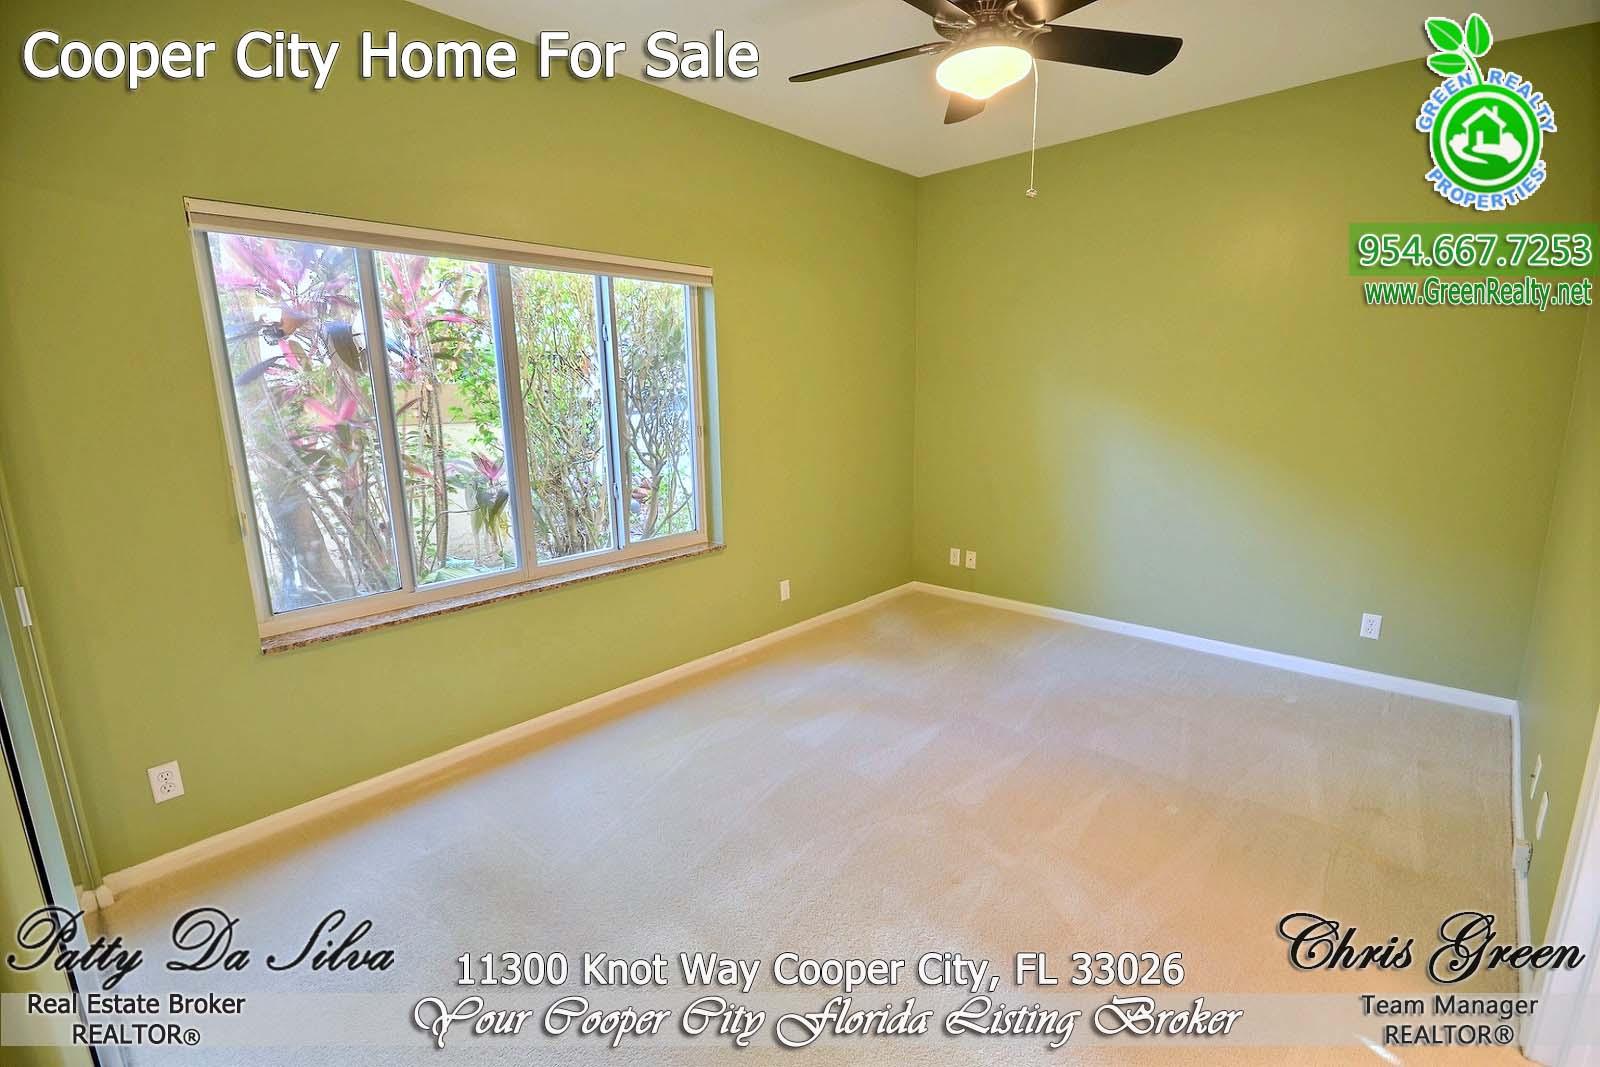 28 Cooper City Real Estate Agents (1)